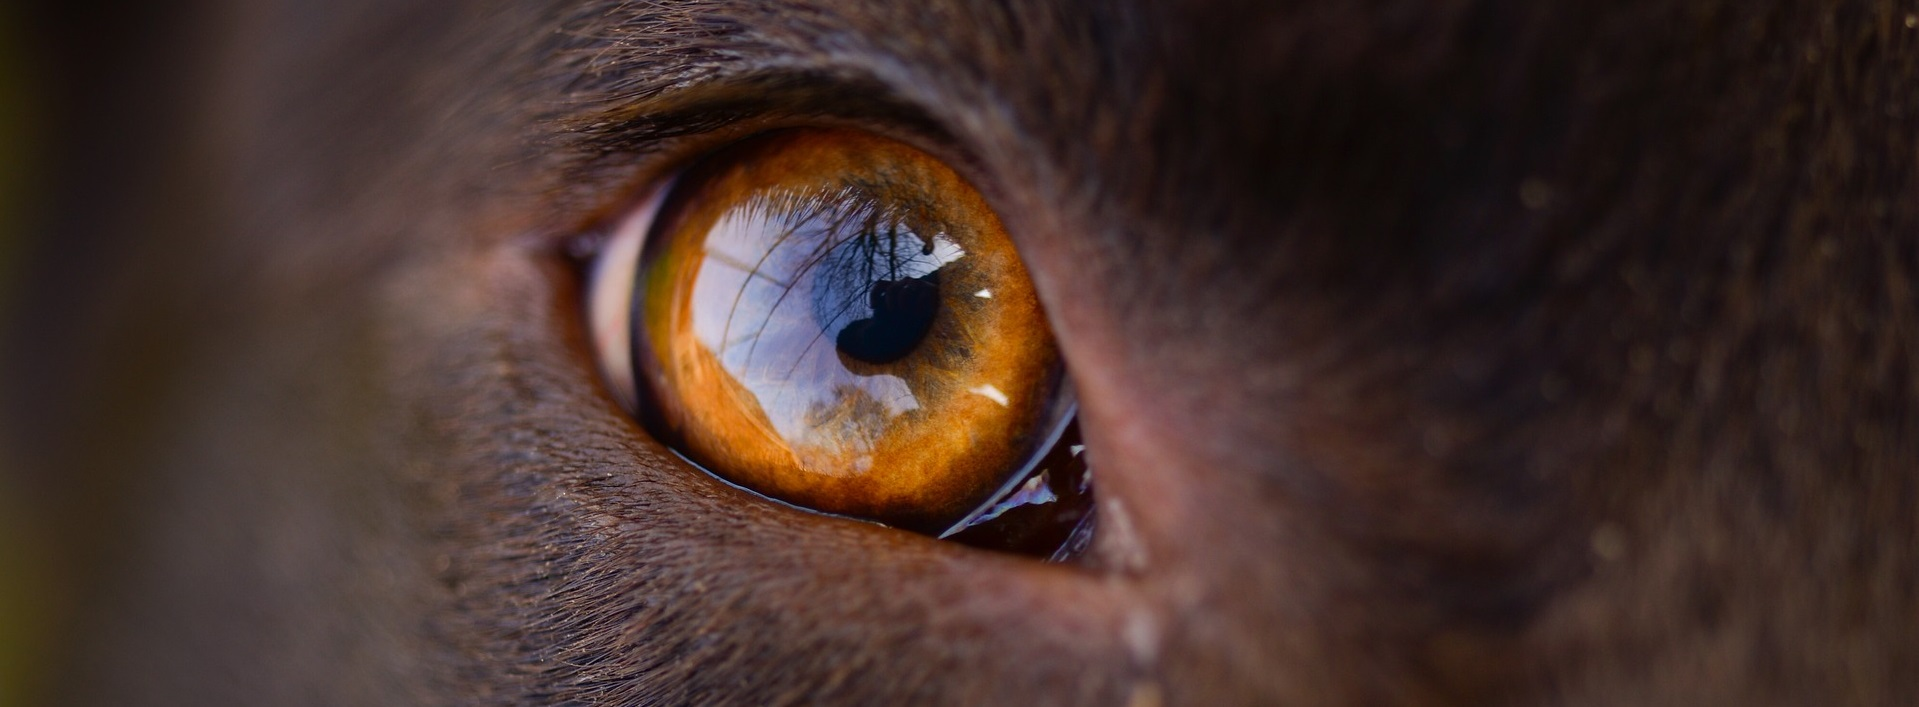 Makroaufnahme eines Hundeauges